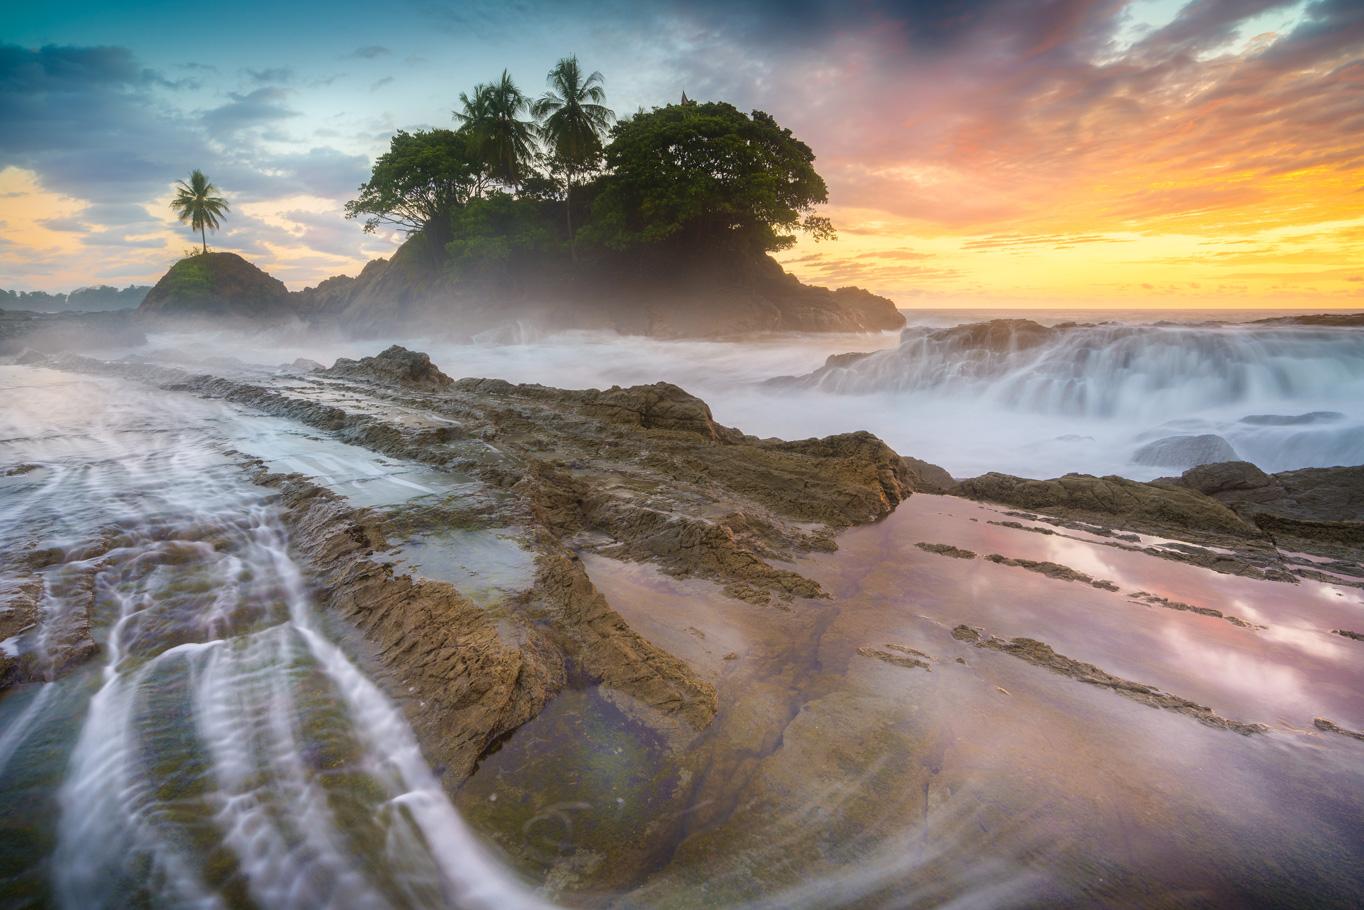 12 Day Costa Rica Wildlife & Landscape Photography Workshop - day 12